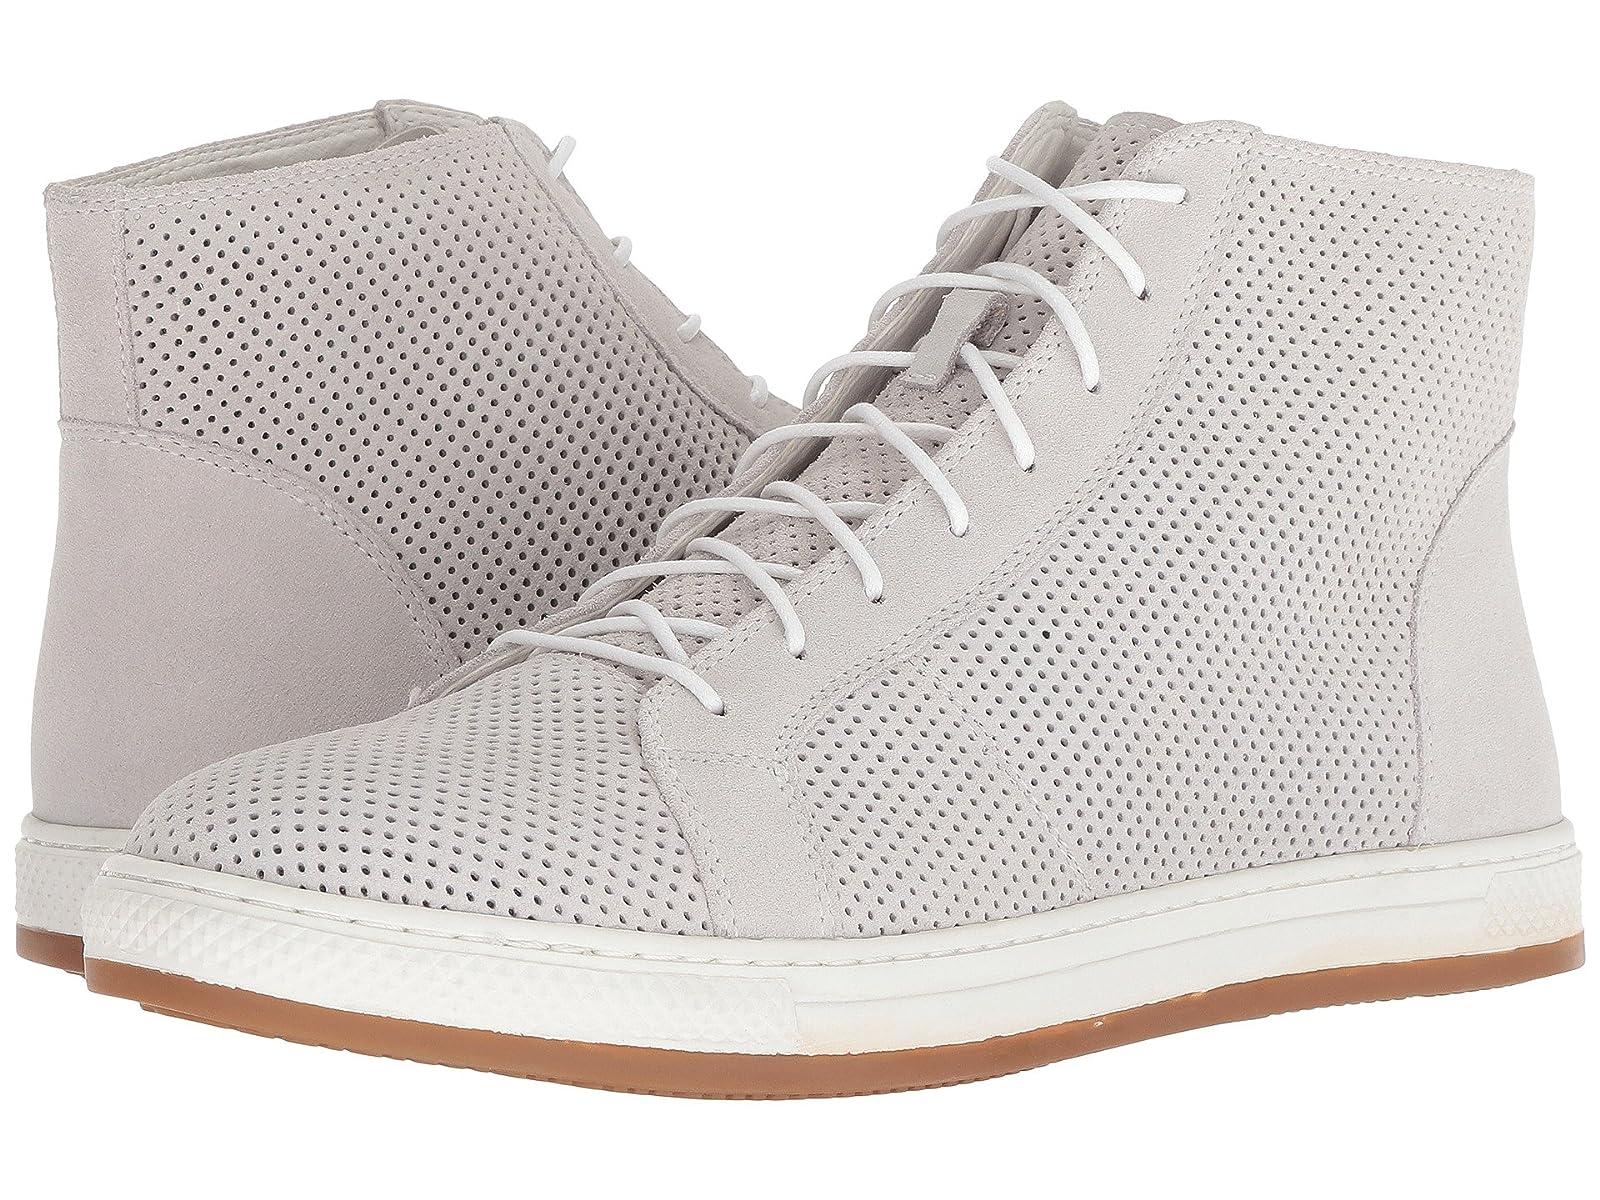 English Laundry WindsorCheap and distinctive eye-catching shoes